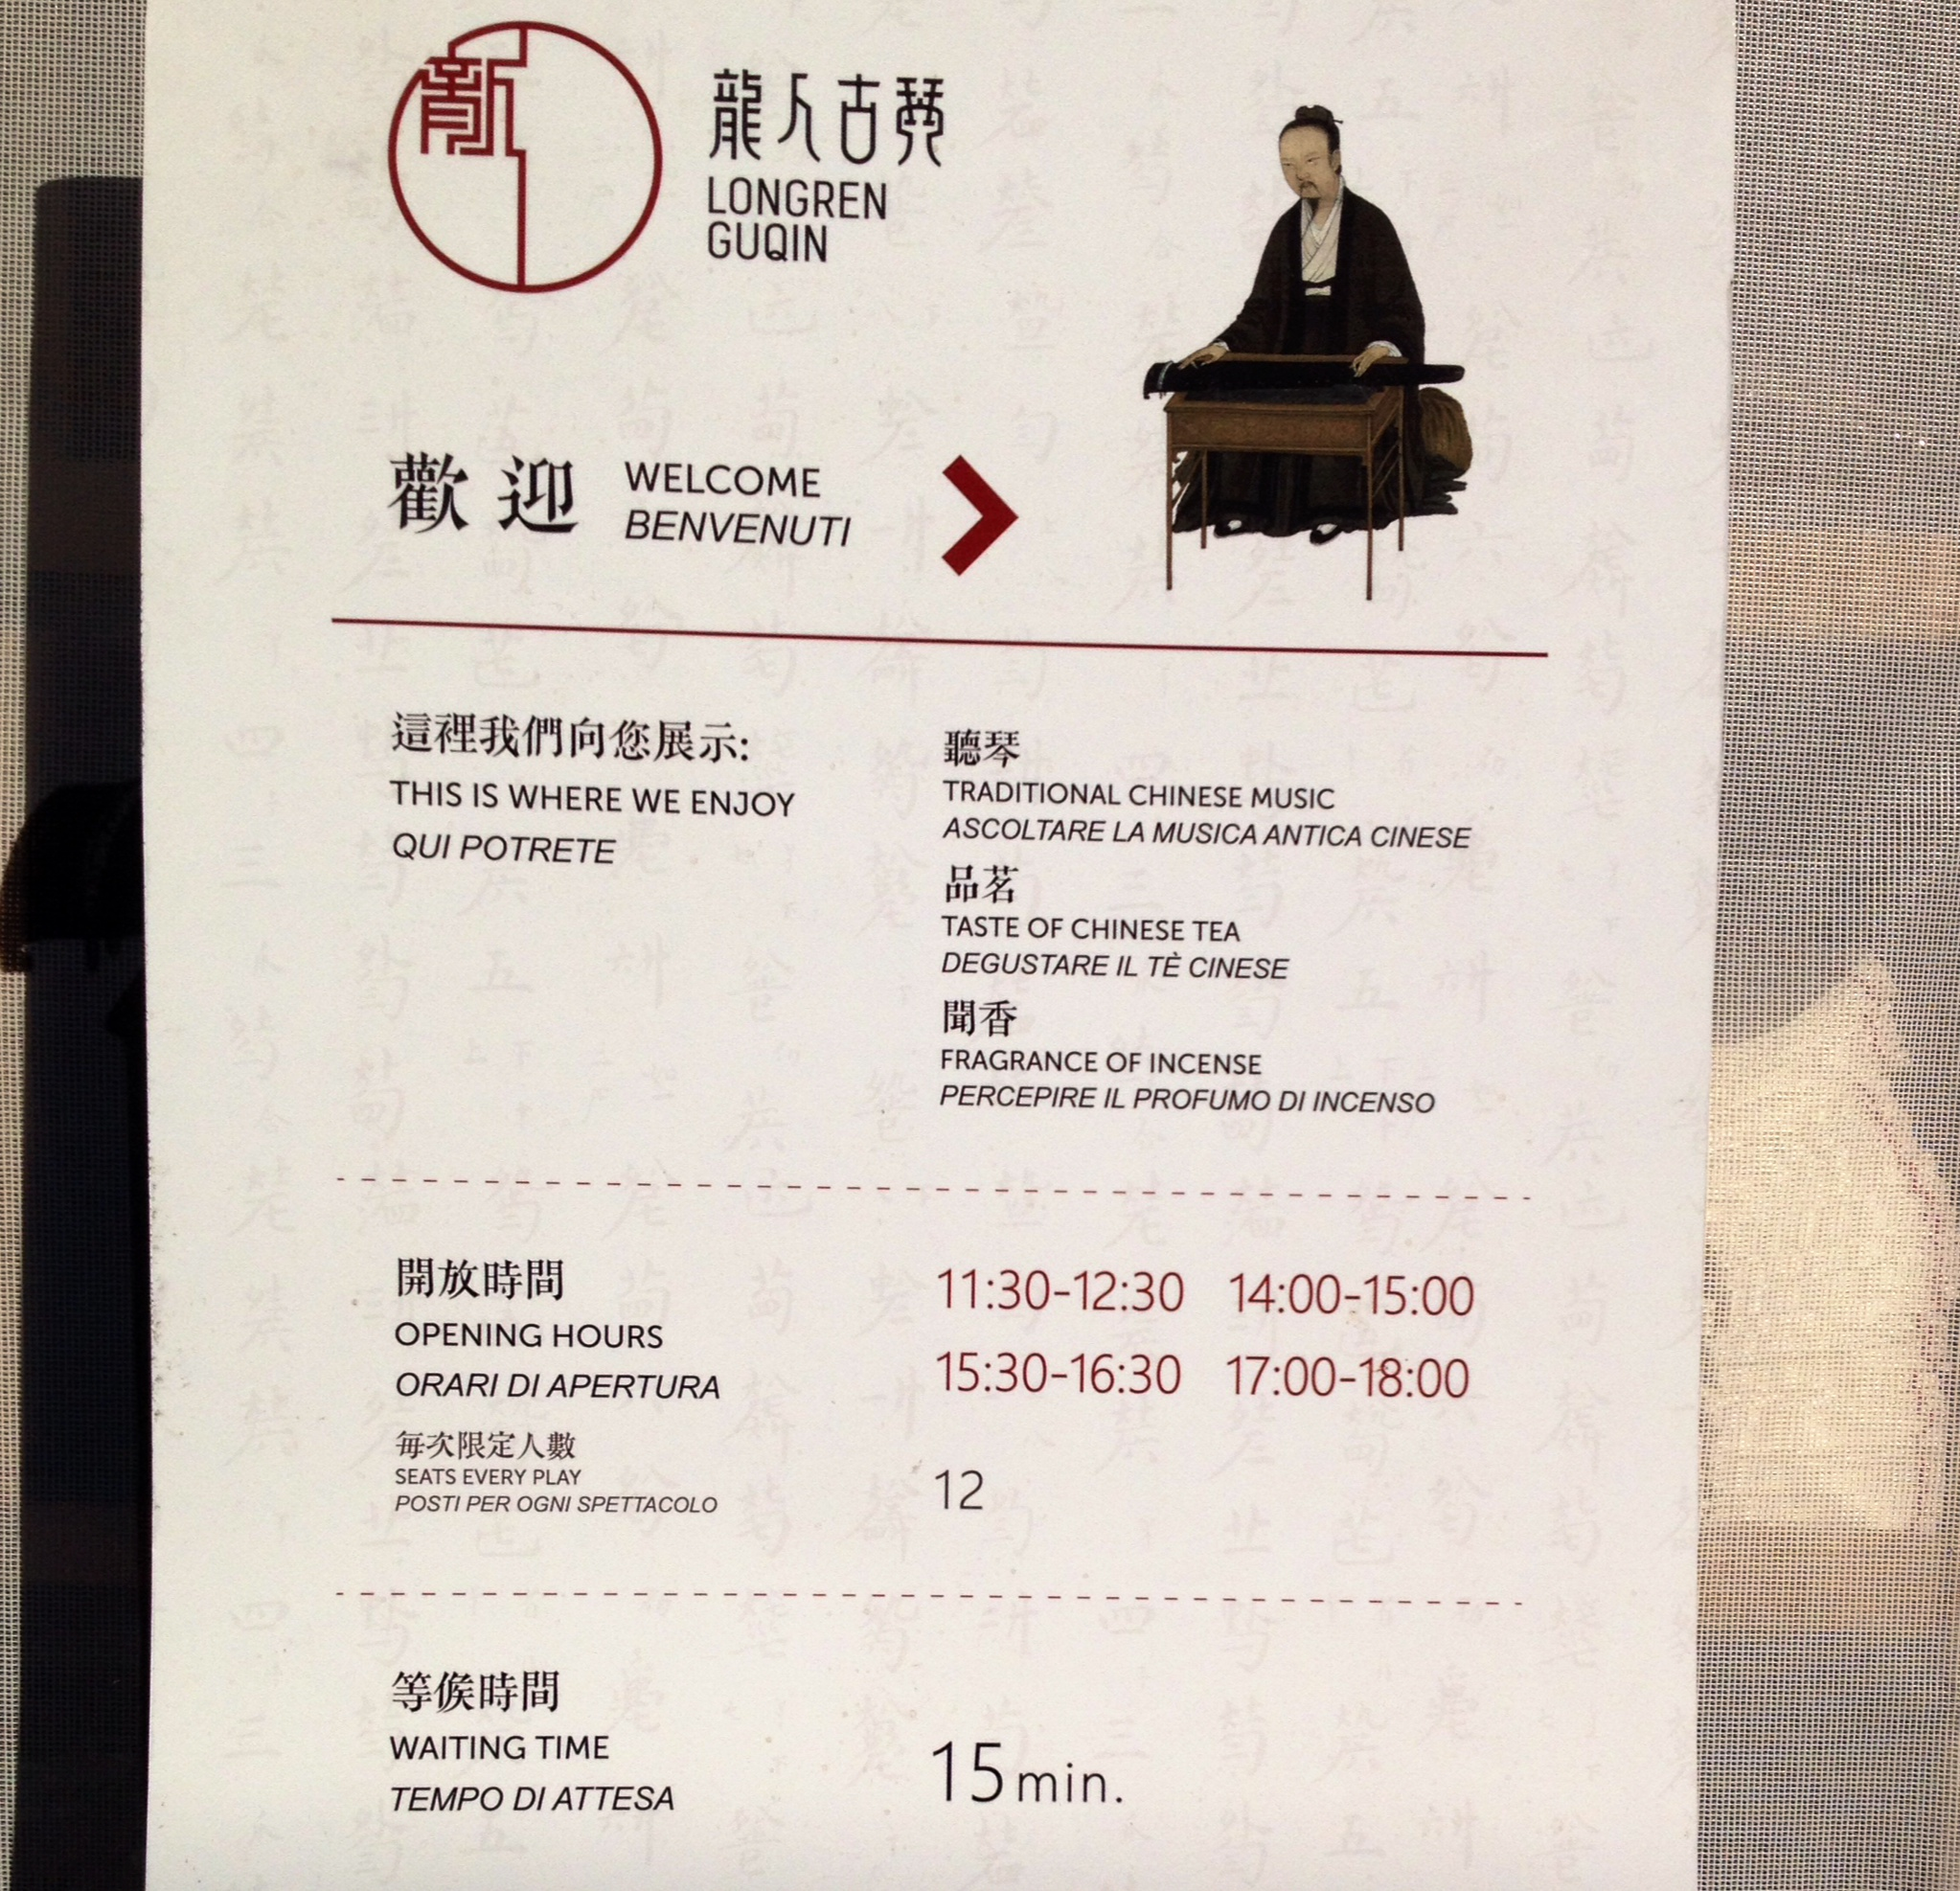 Eventi padiglione cinese